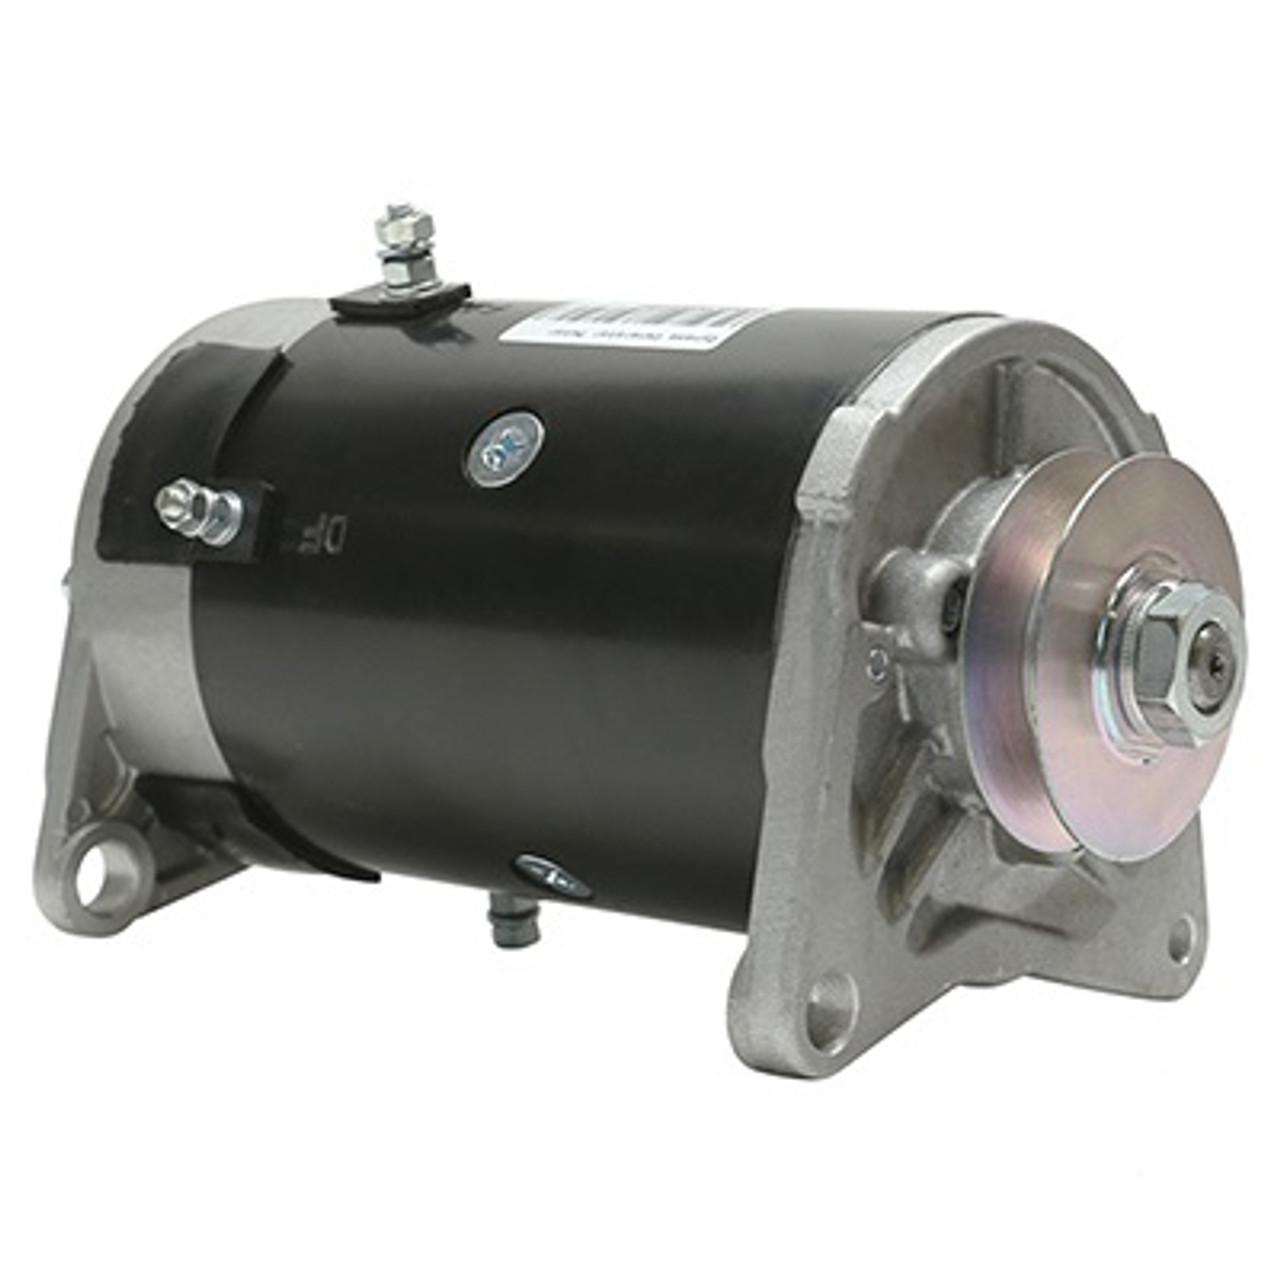 Par Car Wiring Diagram For Starter Generator 03 F250 Wiring Diagram 4x4 Swich Viiintage Yenpancane Jeanjaures37 Fr